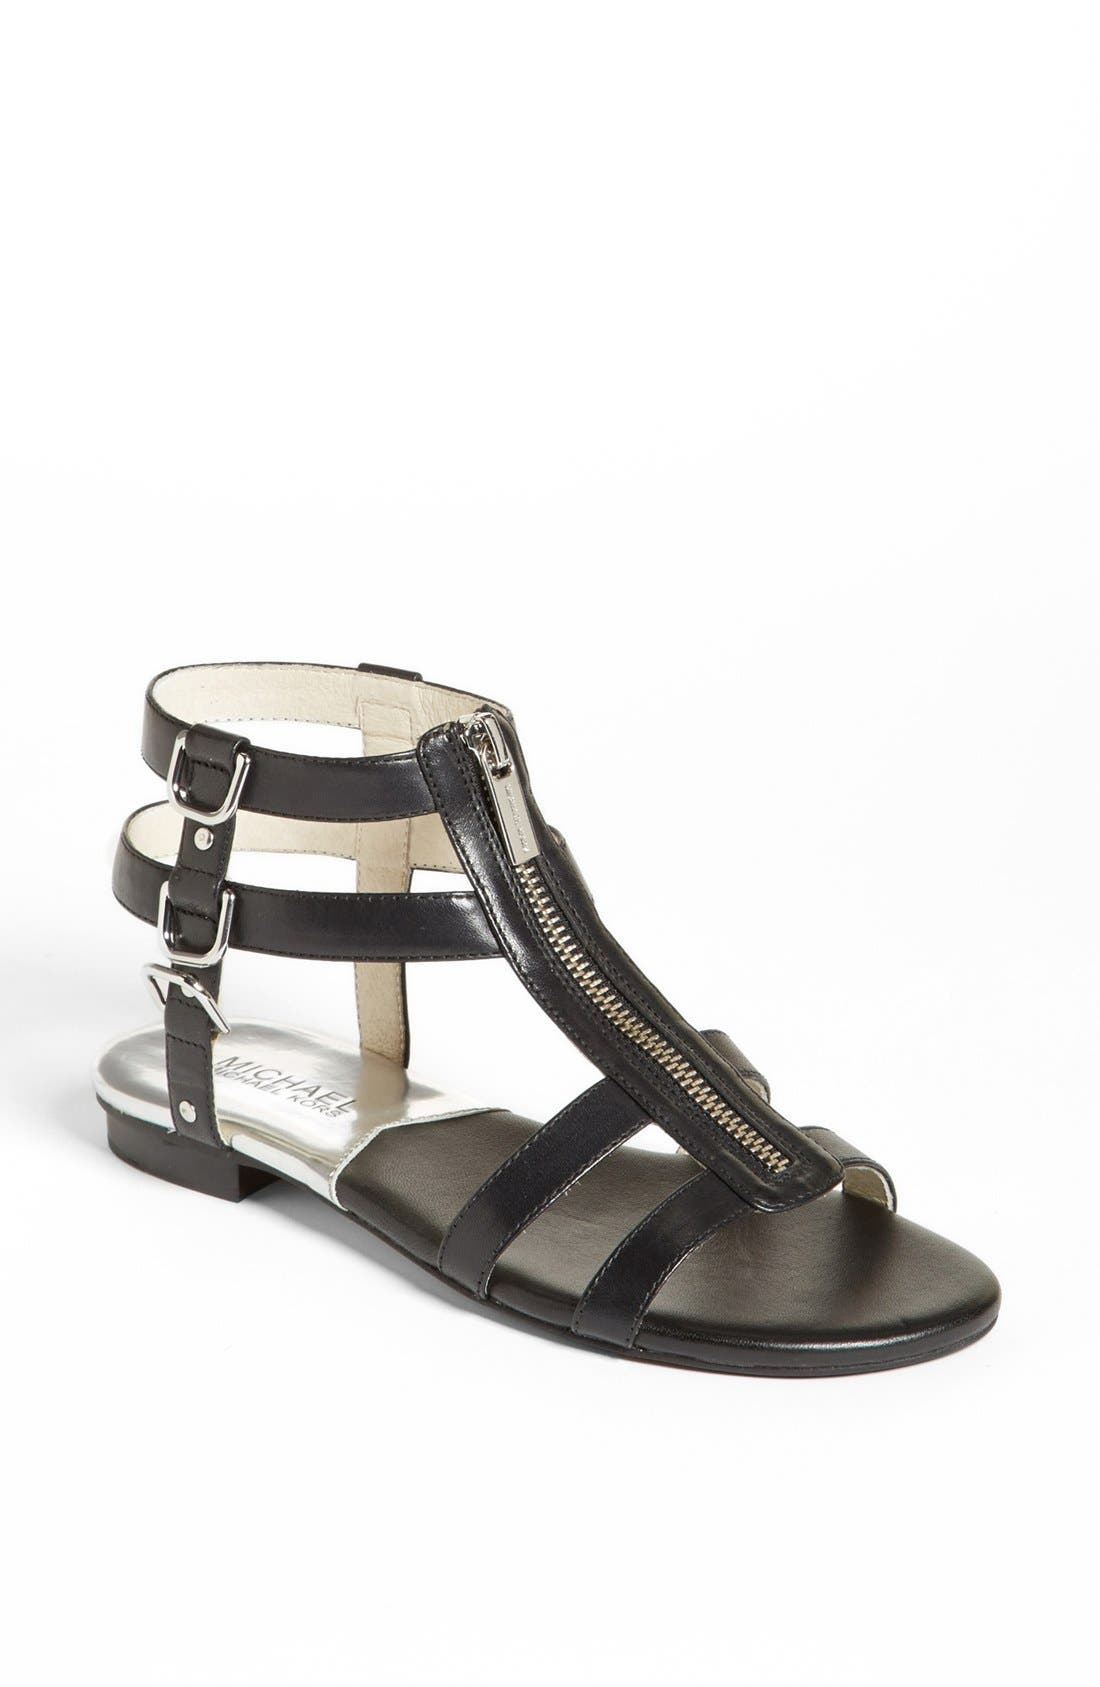 Alternate Image 1 Selected - MICHAEL Michael Kors 'Kennedy' Flat Leather Gladiator Sandal